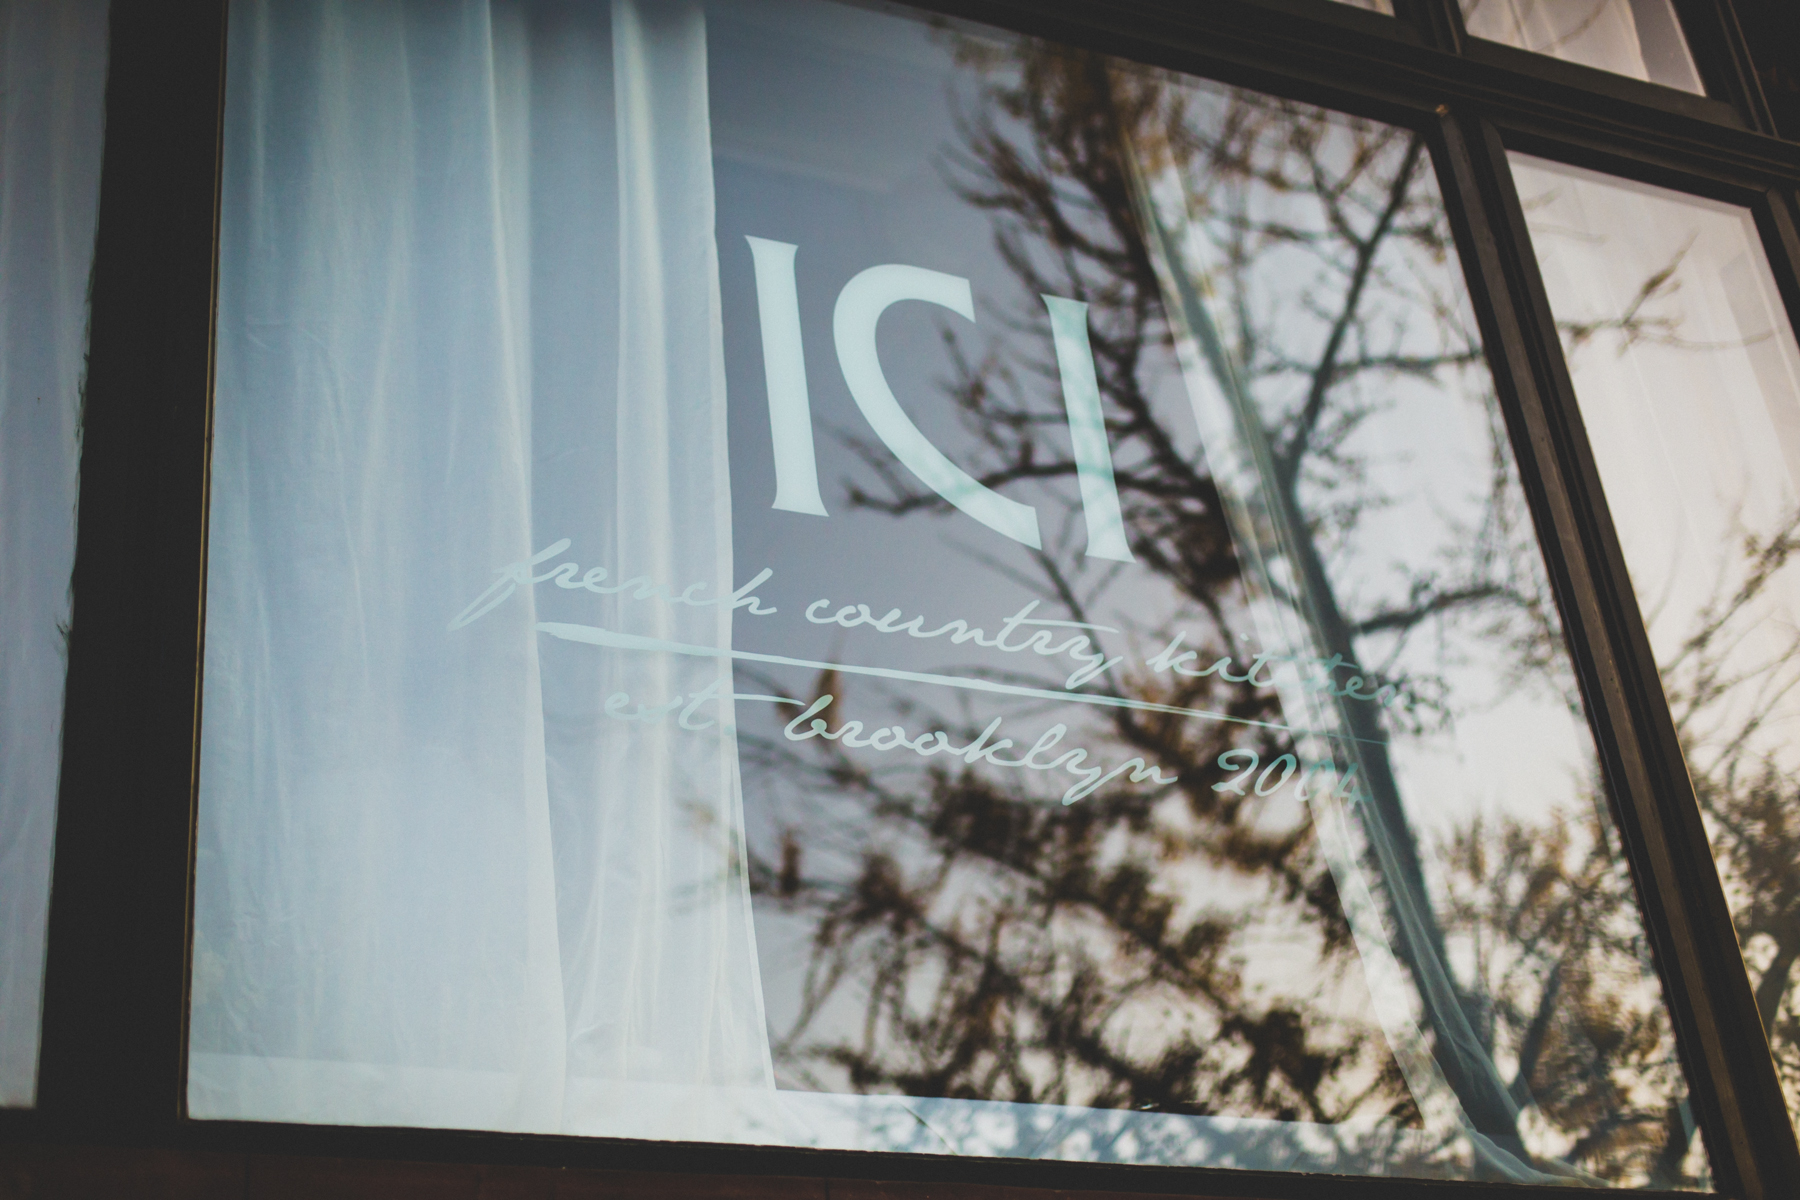 ICI-Restaurant-Fort-Greene-Brooklyn-Intimate-Documentary-Wedding-Photography-Elvira-Kalviste-70.jpg